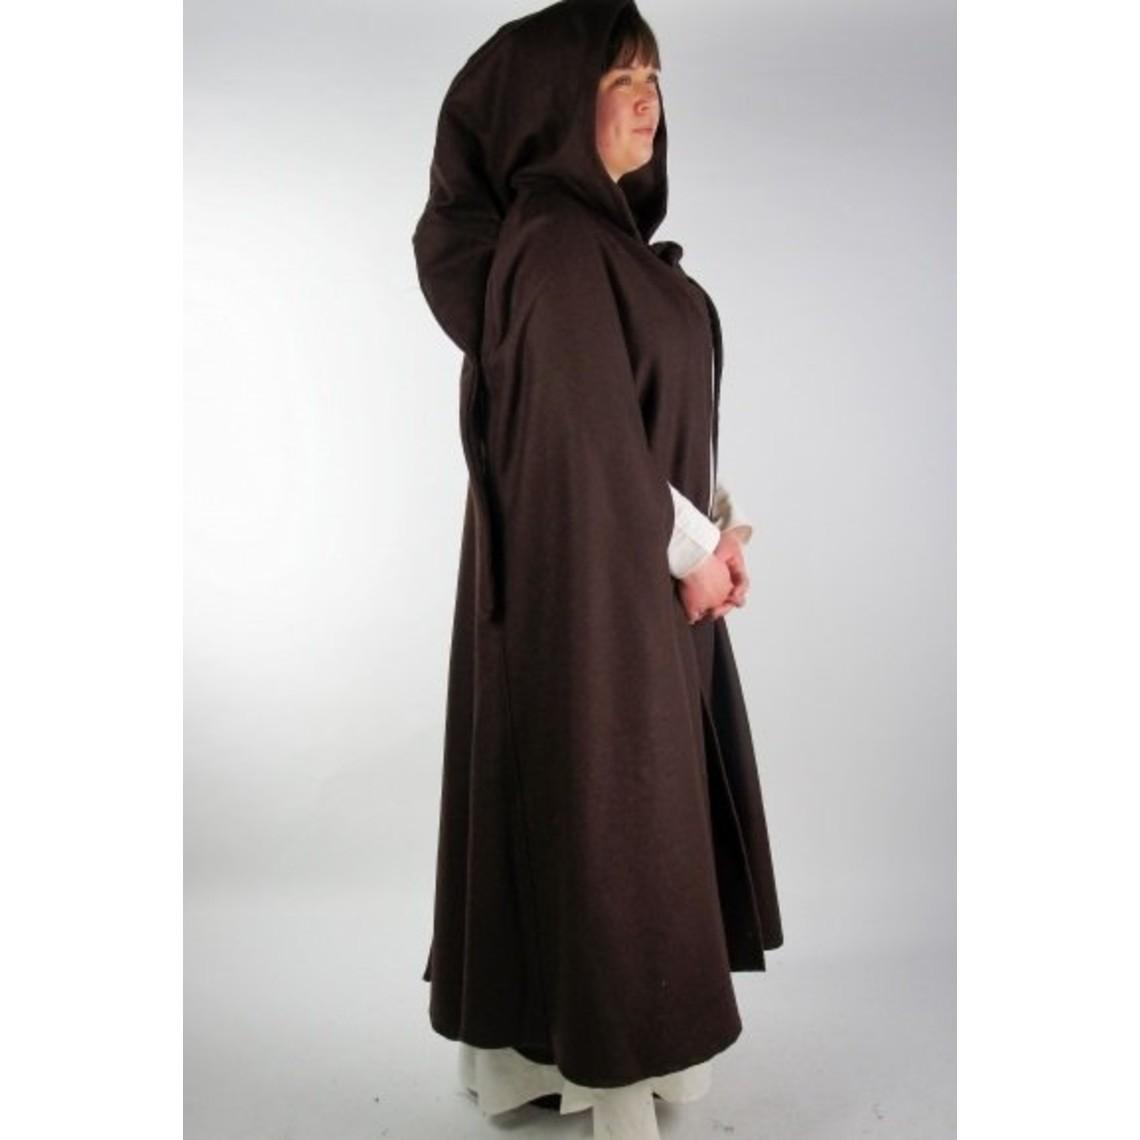 Leonardo Carbone Medieval cloak Odelia